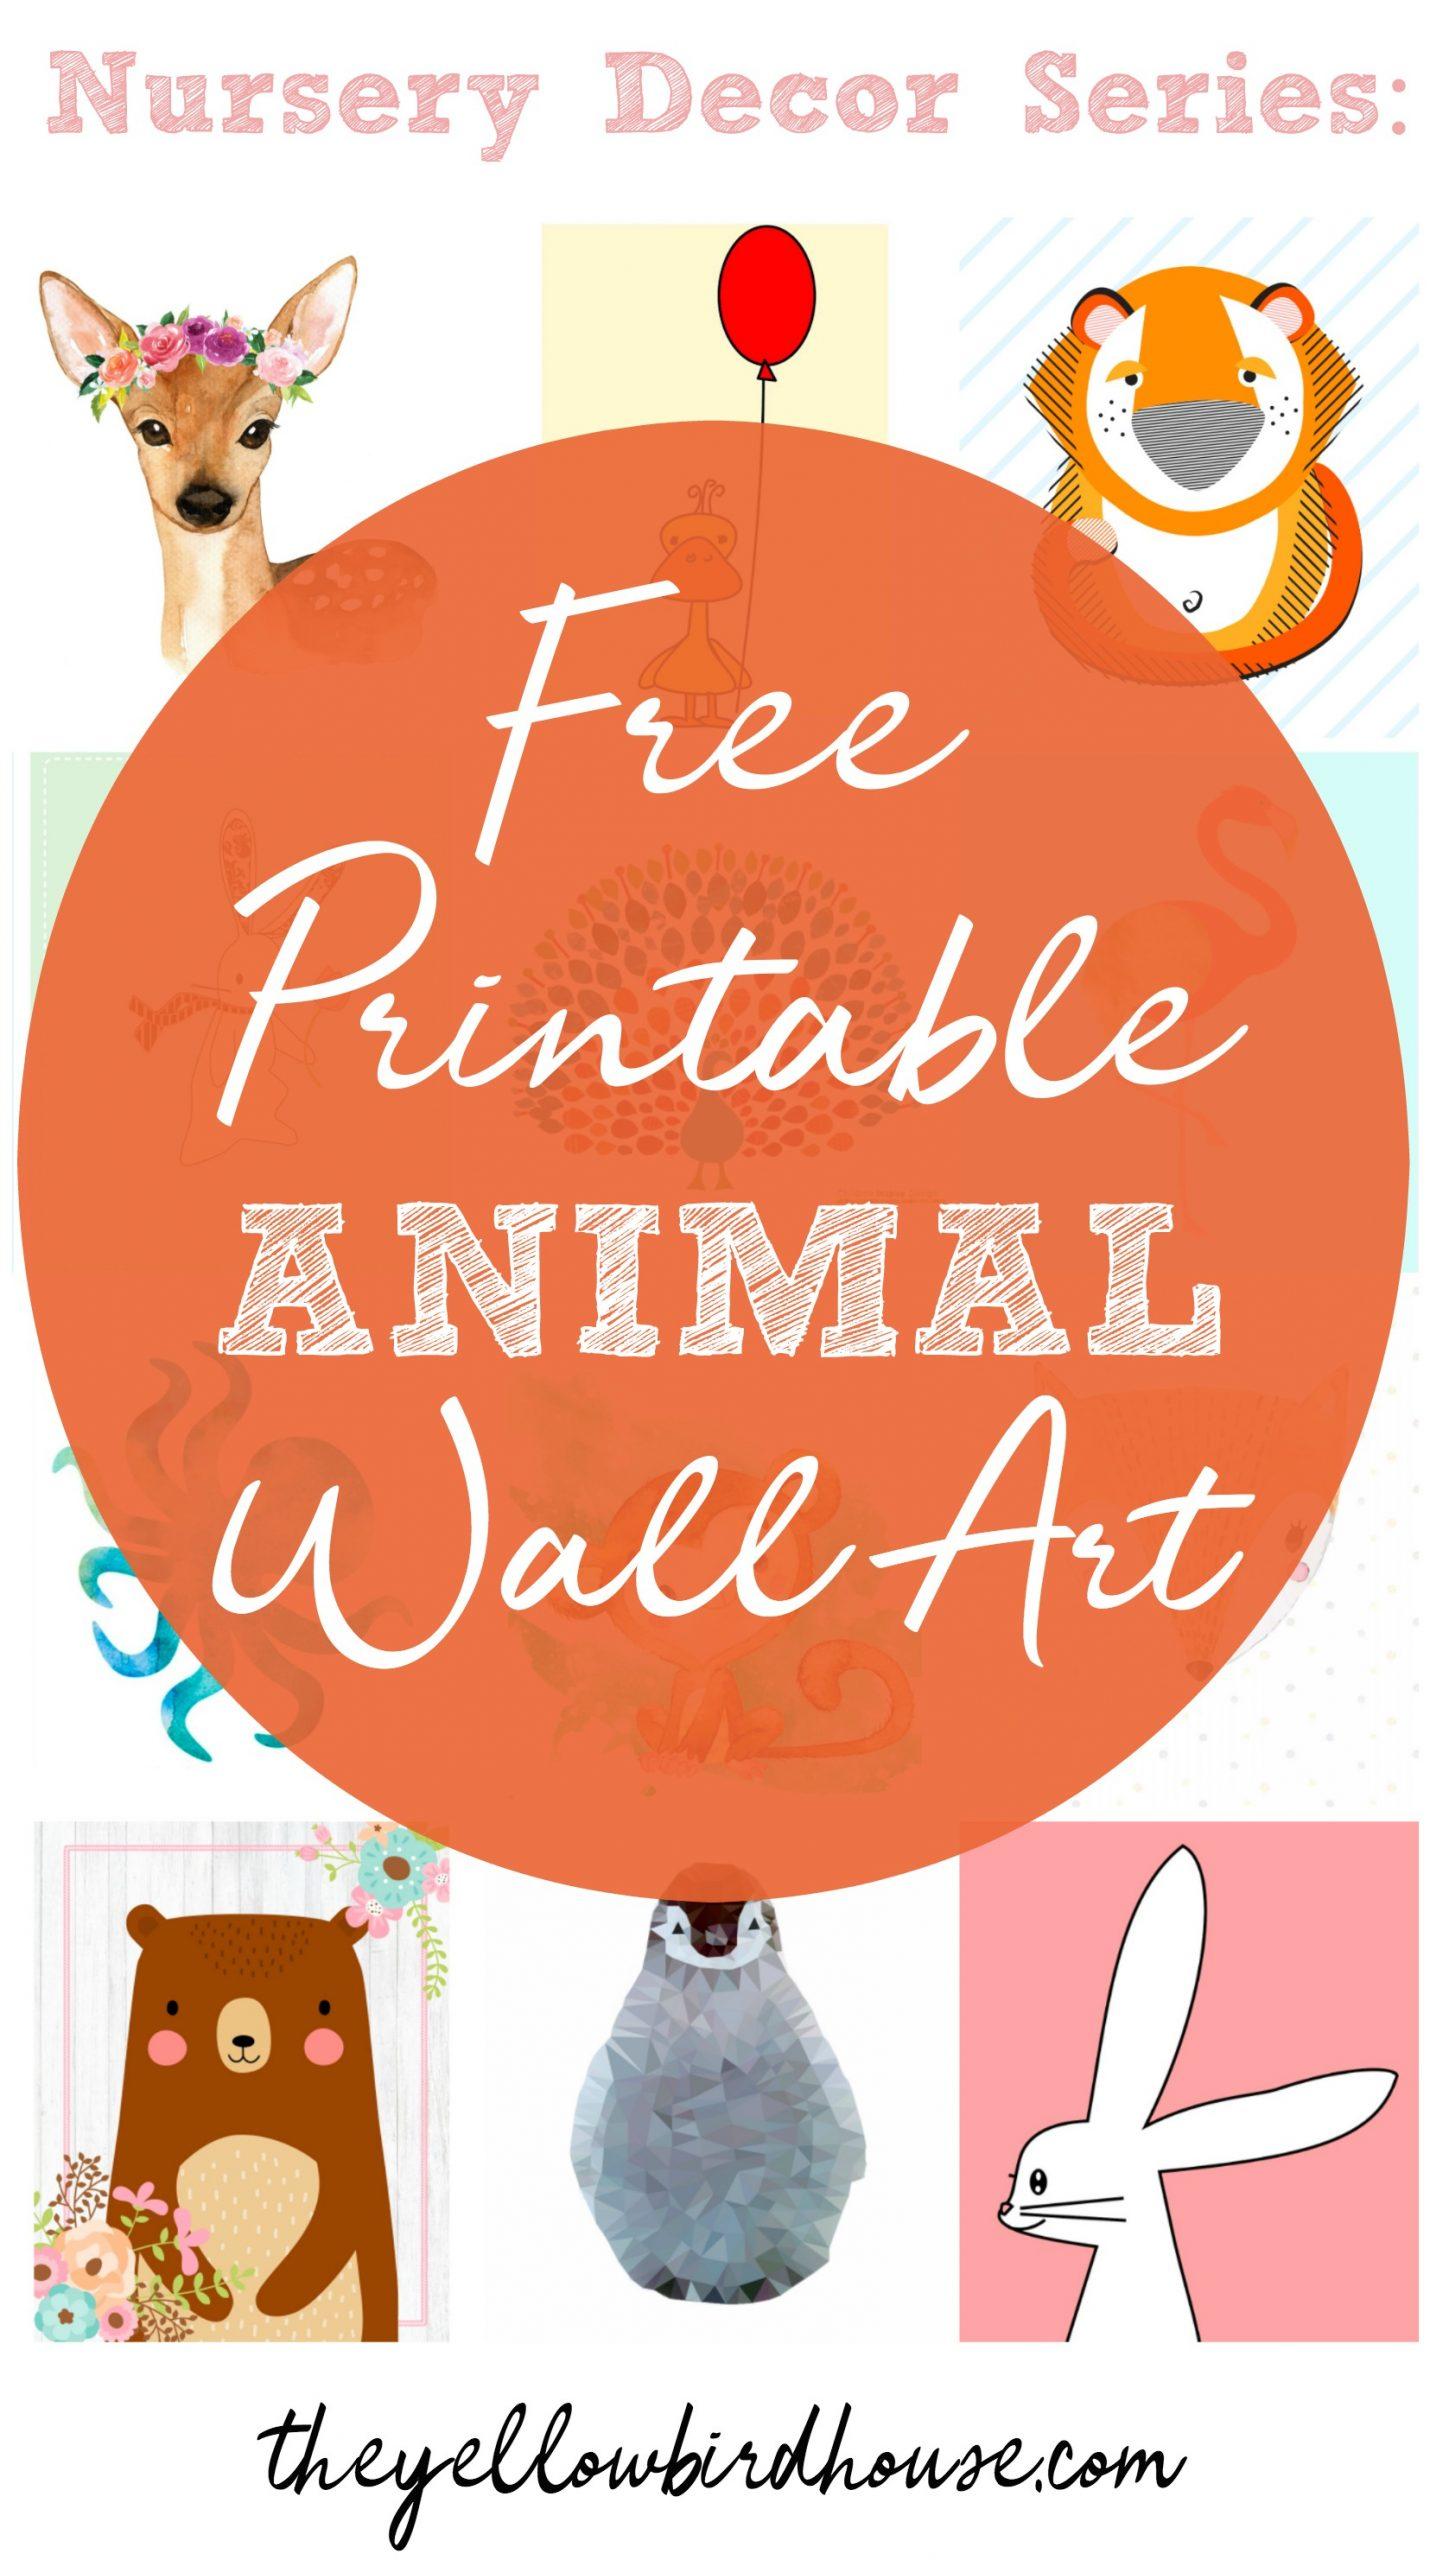 Park Art|My WordPress Blog_Download Prints Posters Nursery  Gif